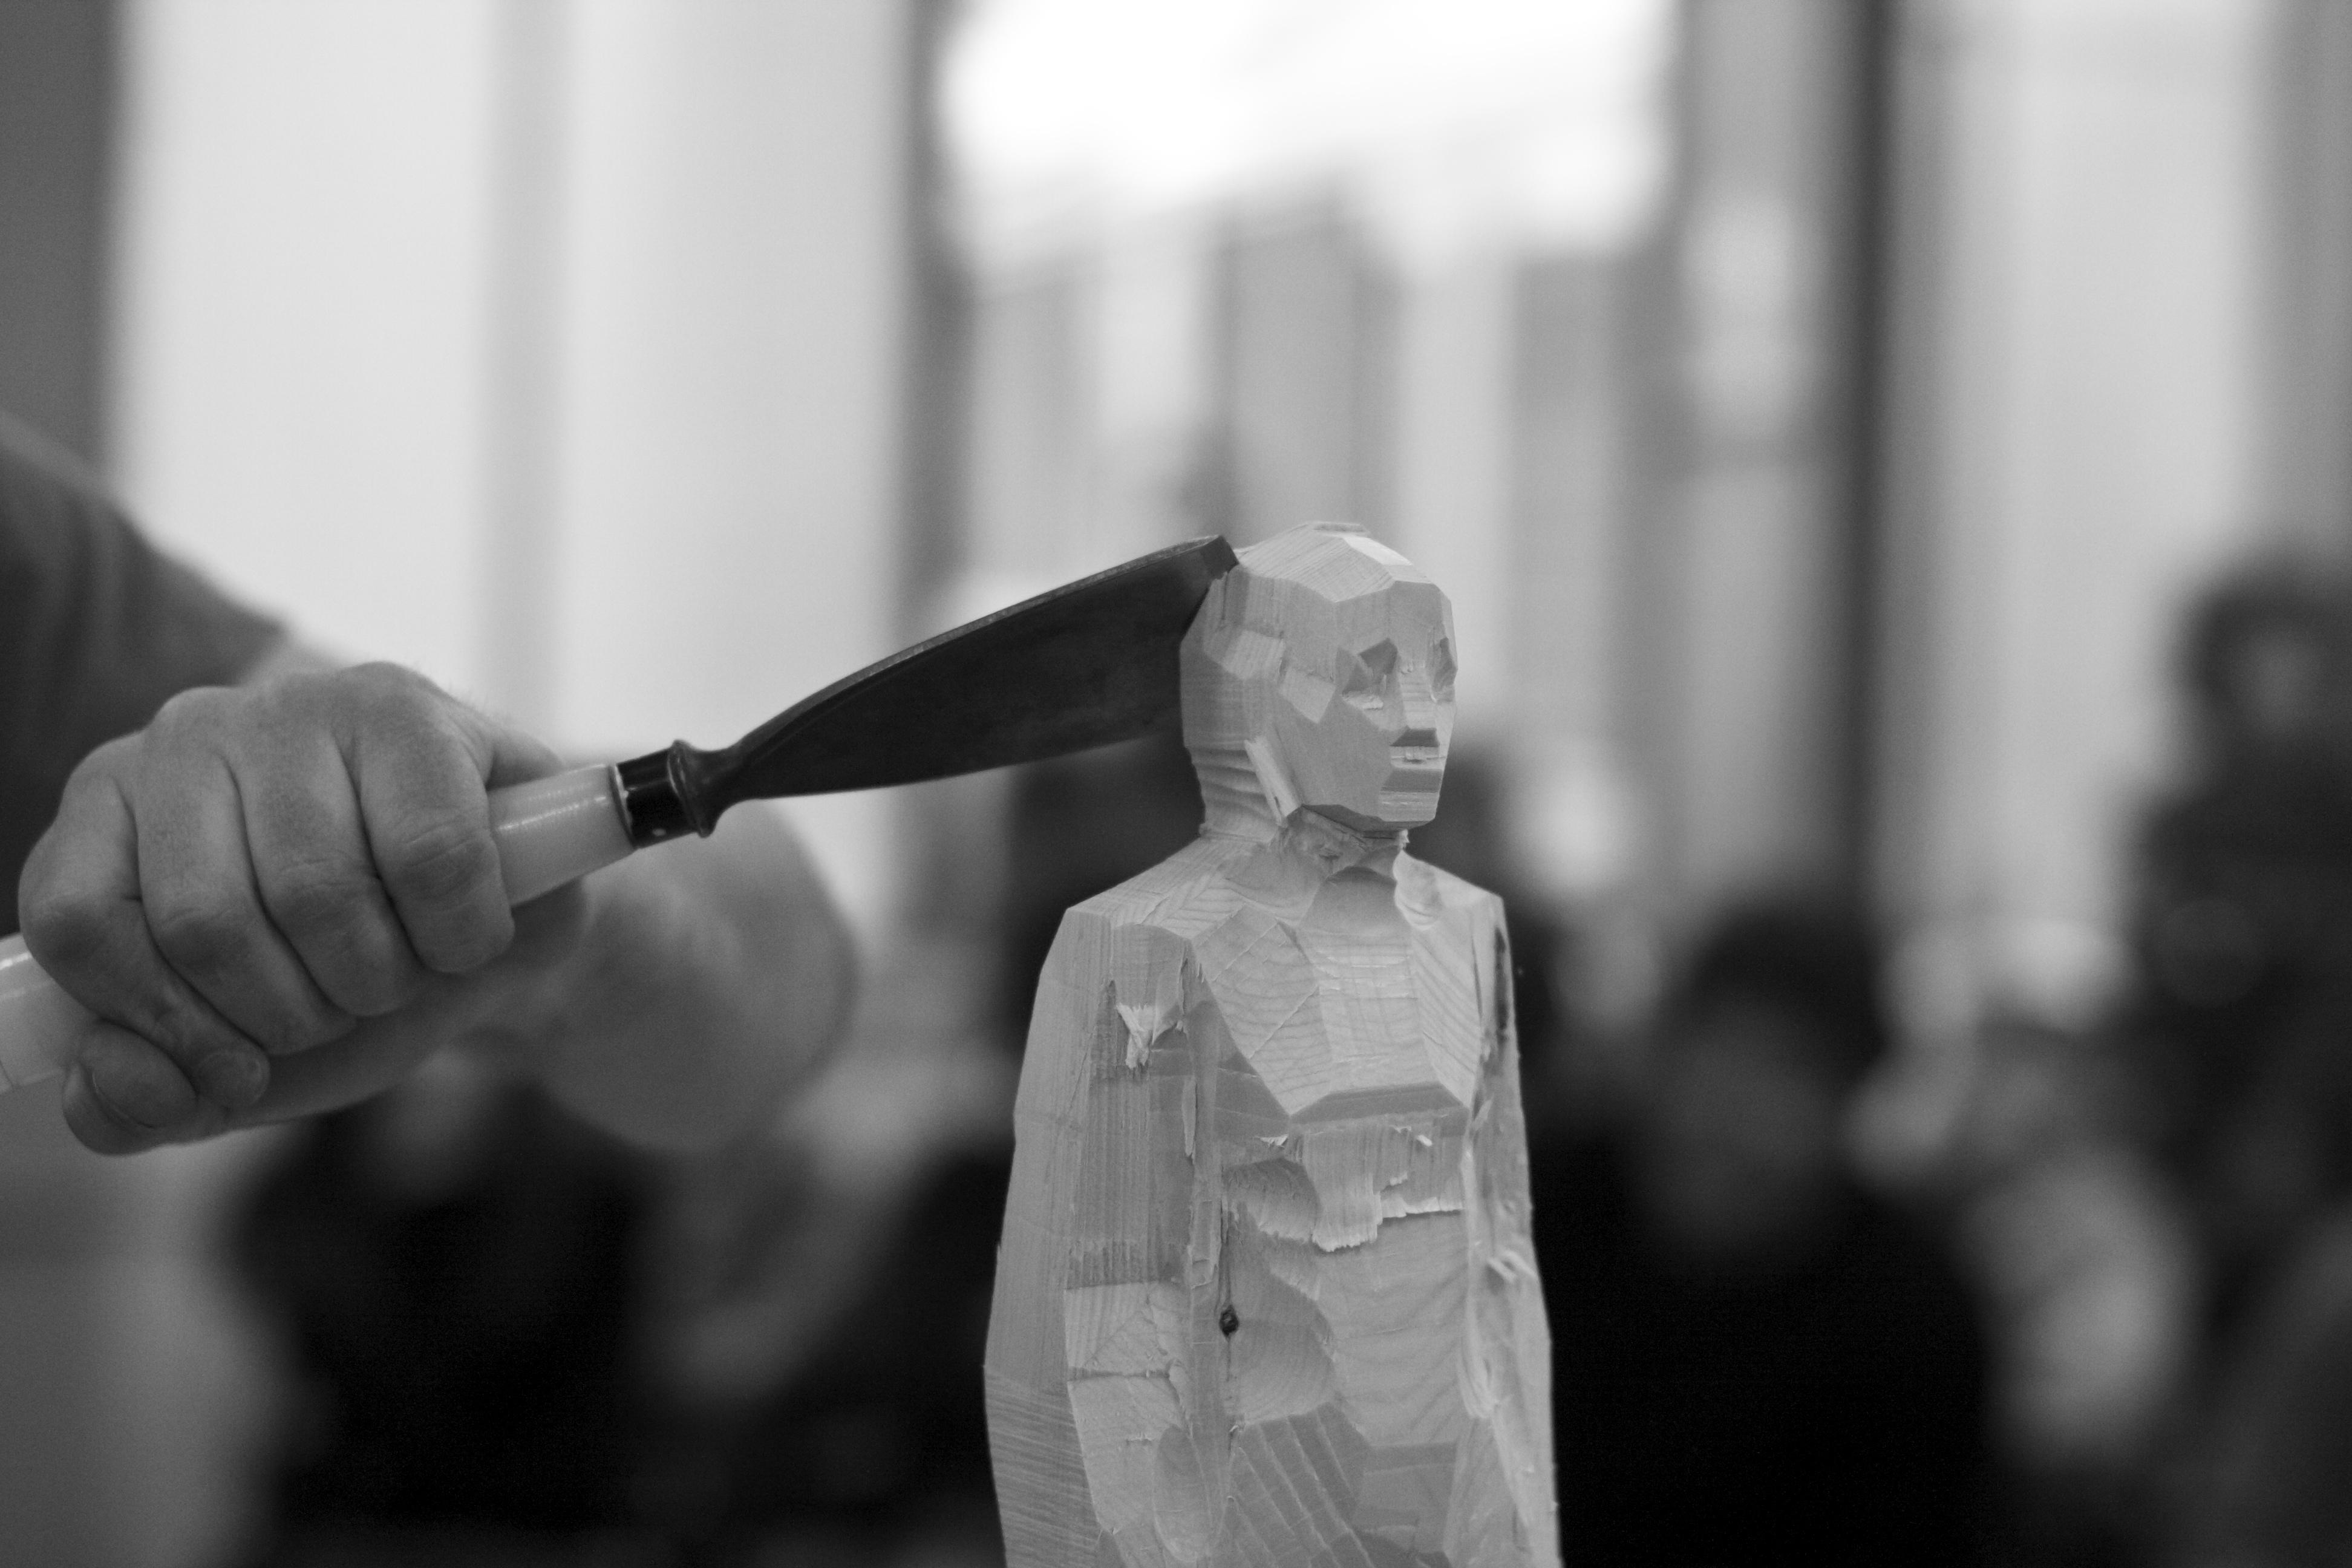 Flickr - Aron Demetz - Dialoghi e materia - Workshop a cura di Franco Reina80